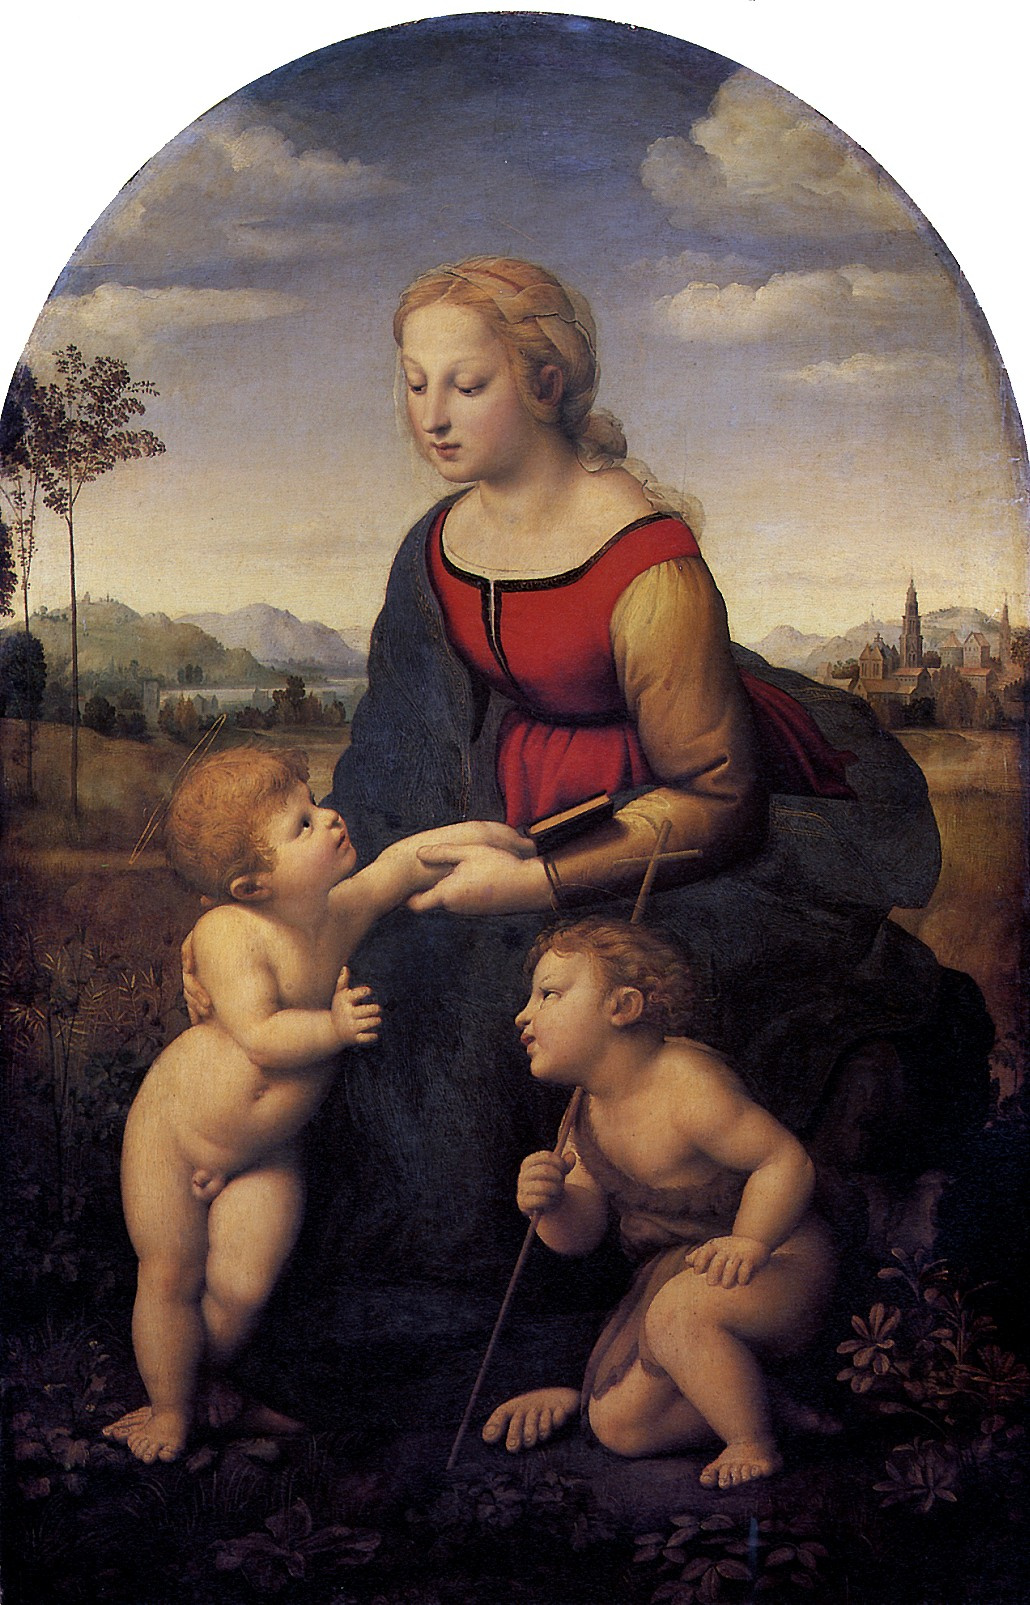 Raphael Santi. A great gardener. Madonna and child with John the Baptist